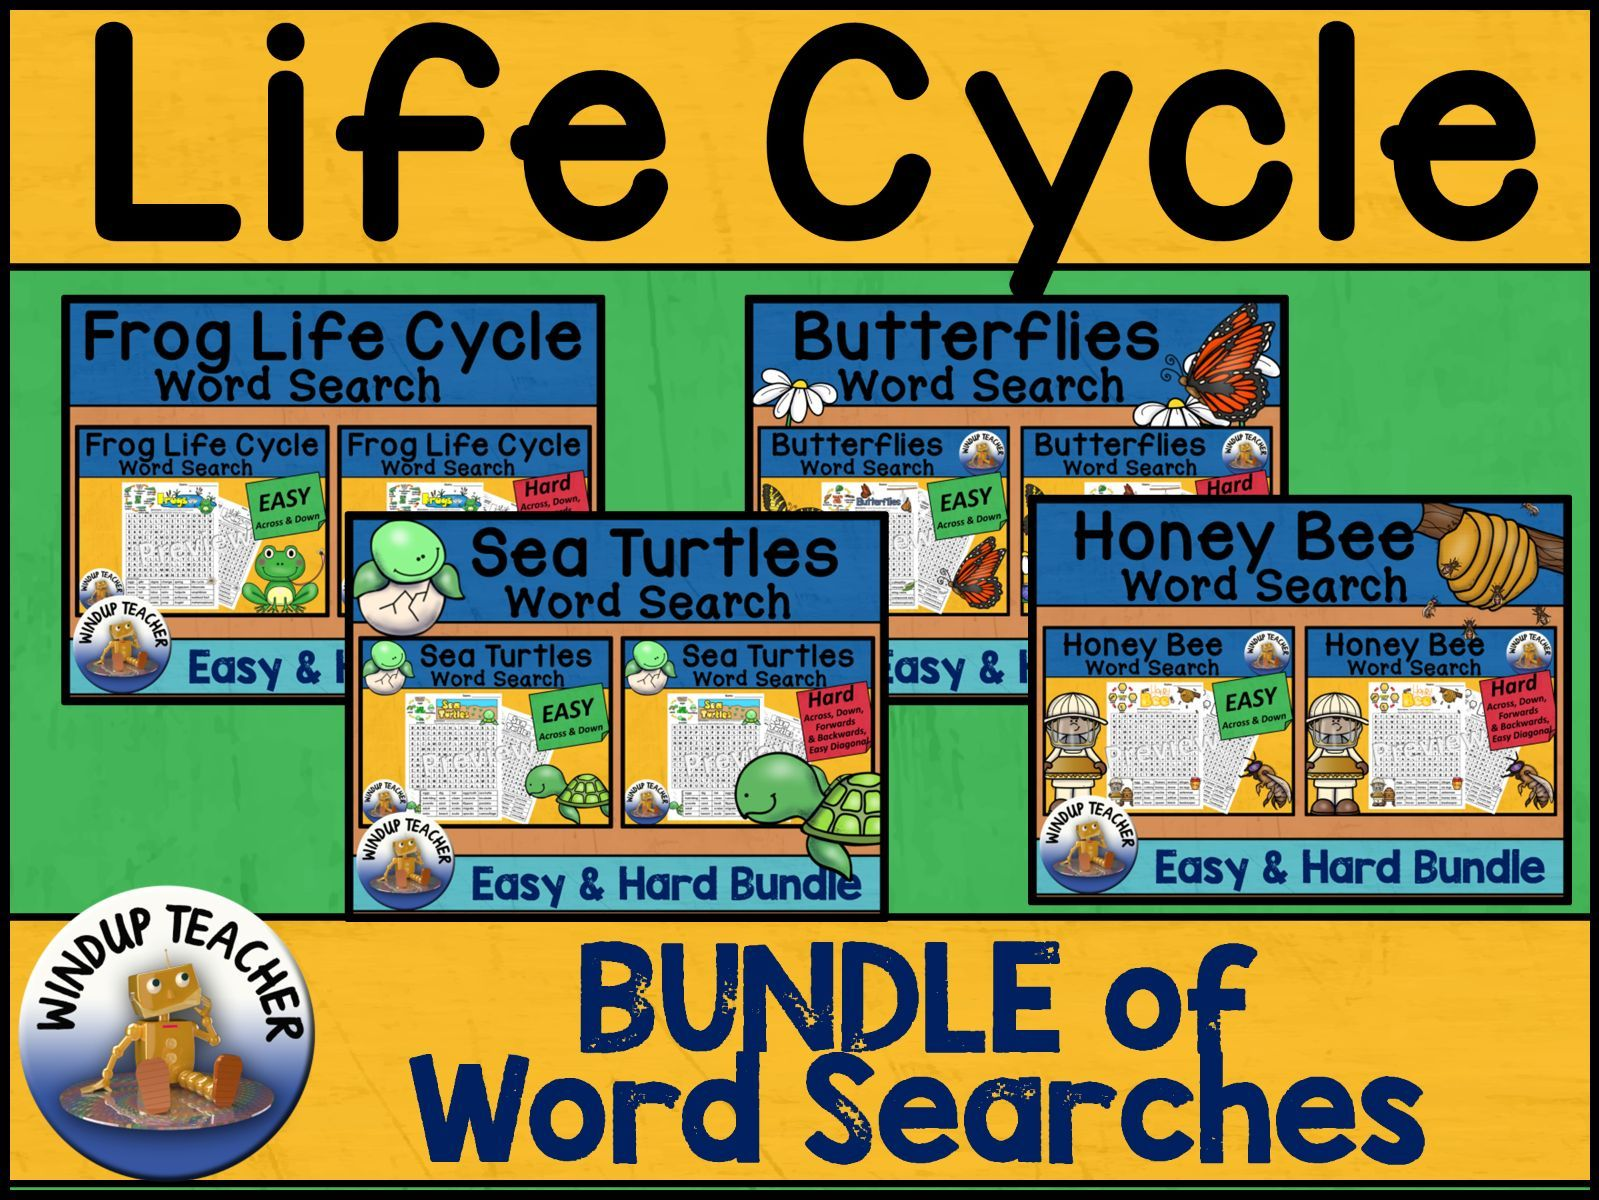 LIfe Cycle Word Search BUNDLE